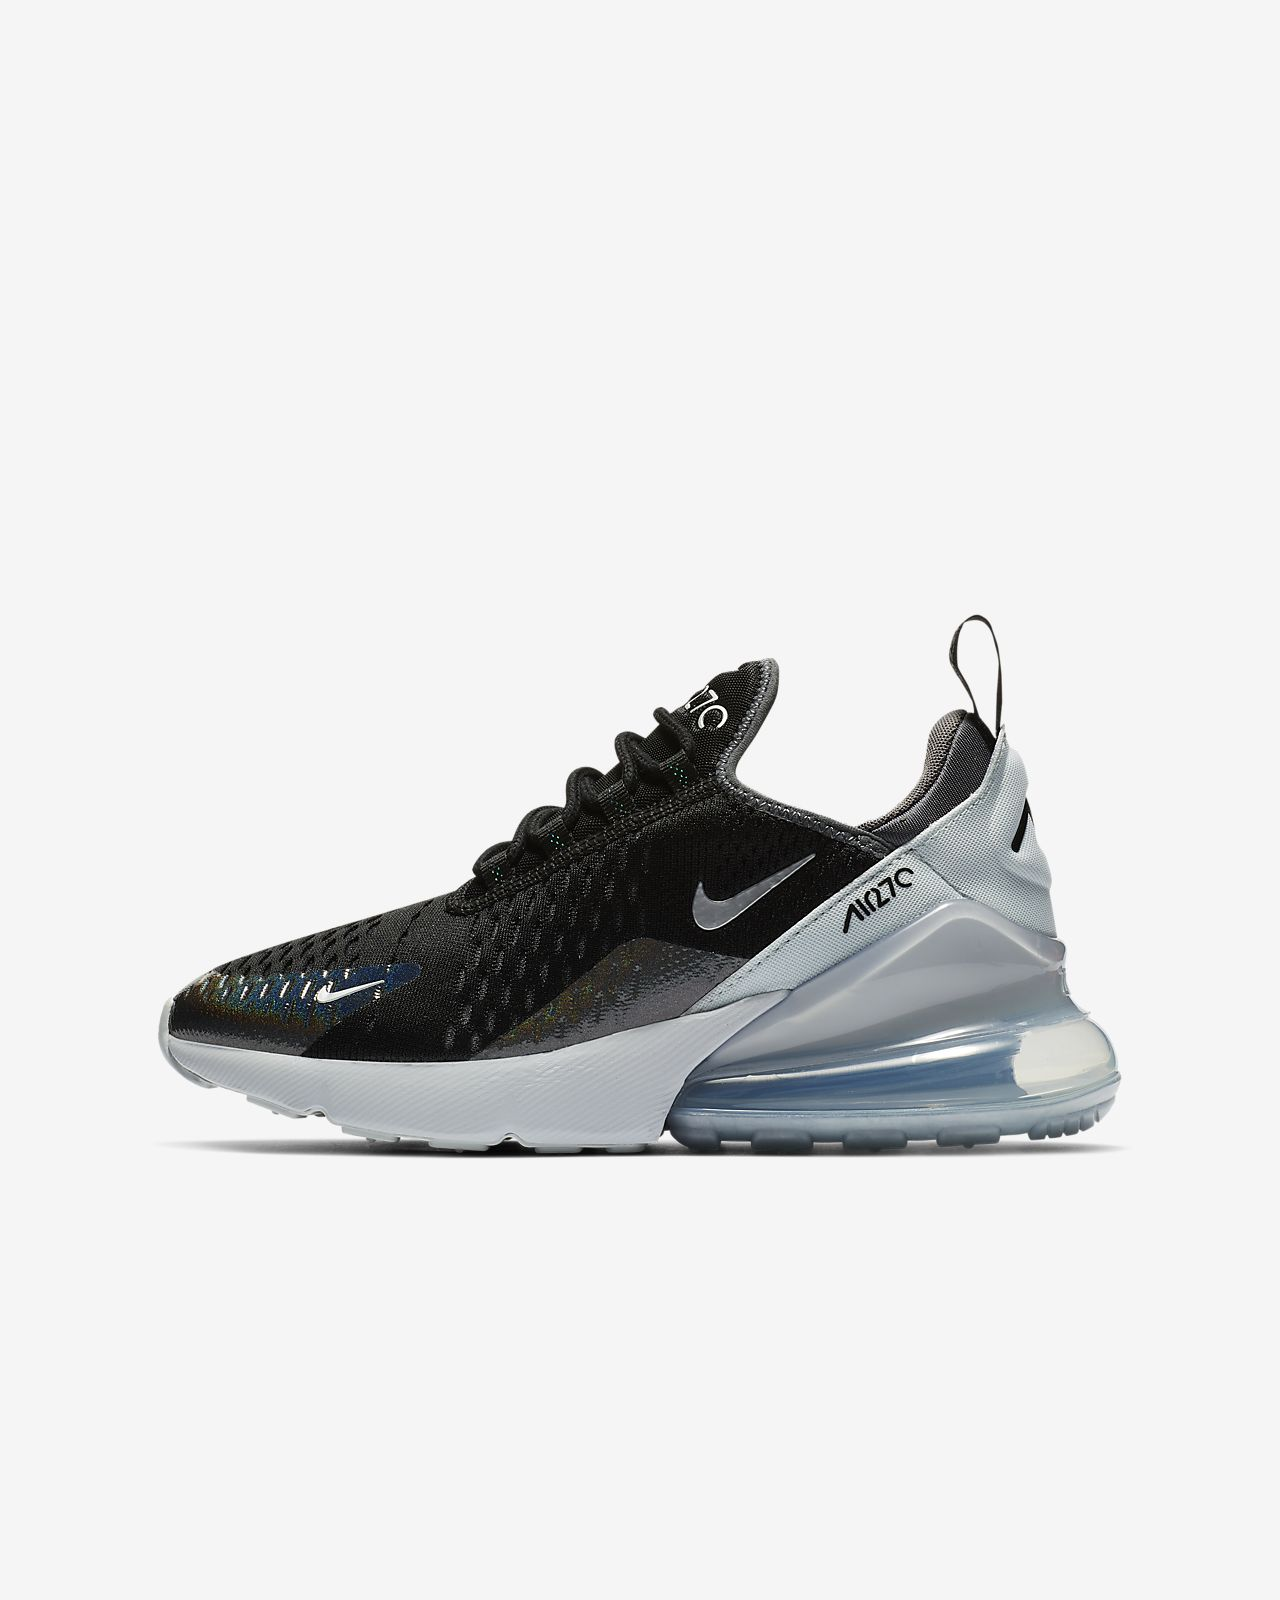 Nike Air Max 270 Y2K Big Kids' Shoe